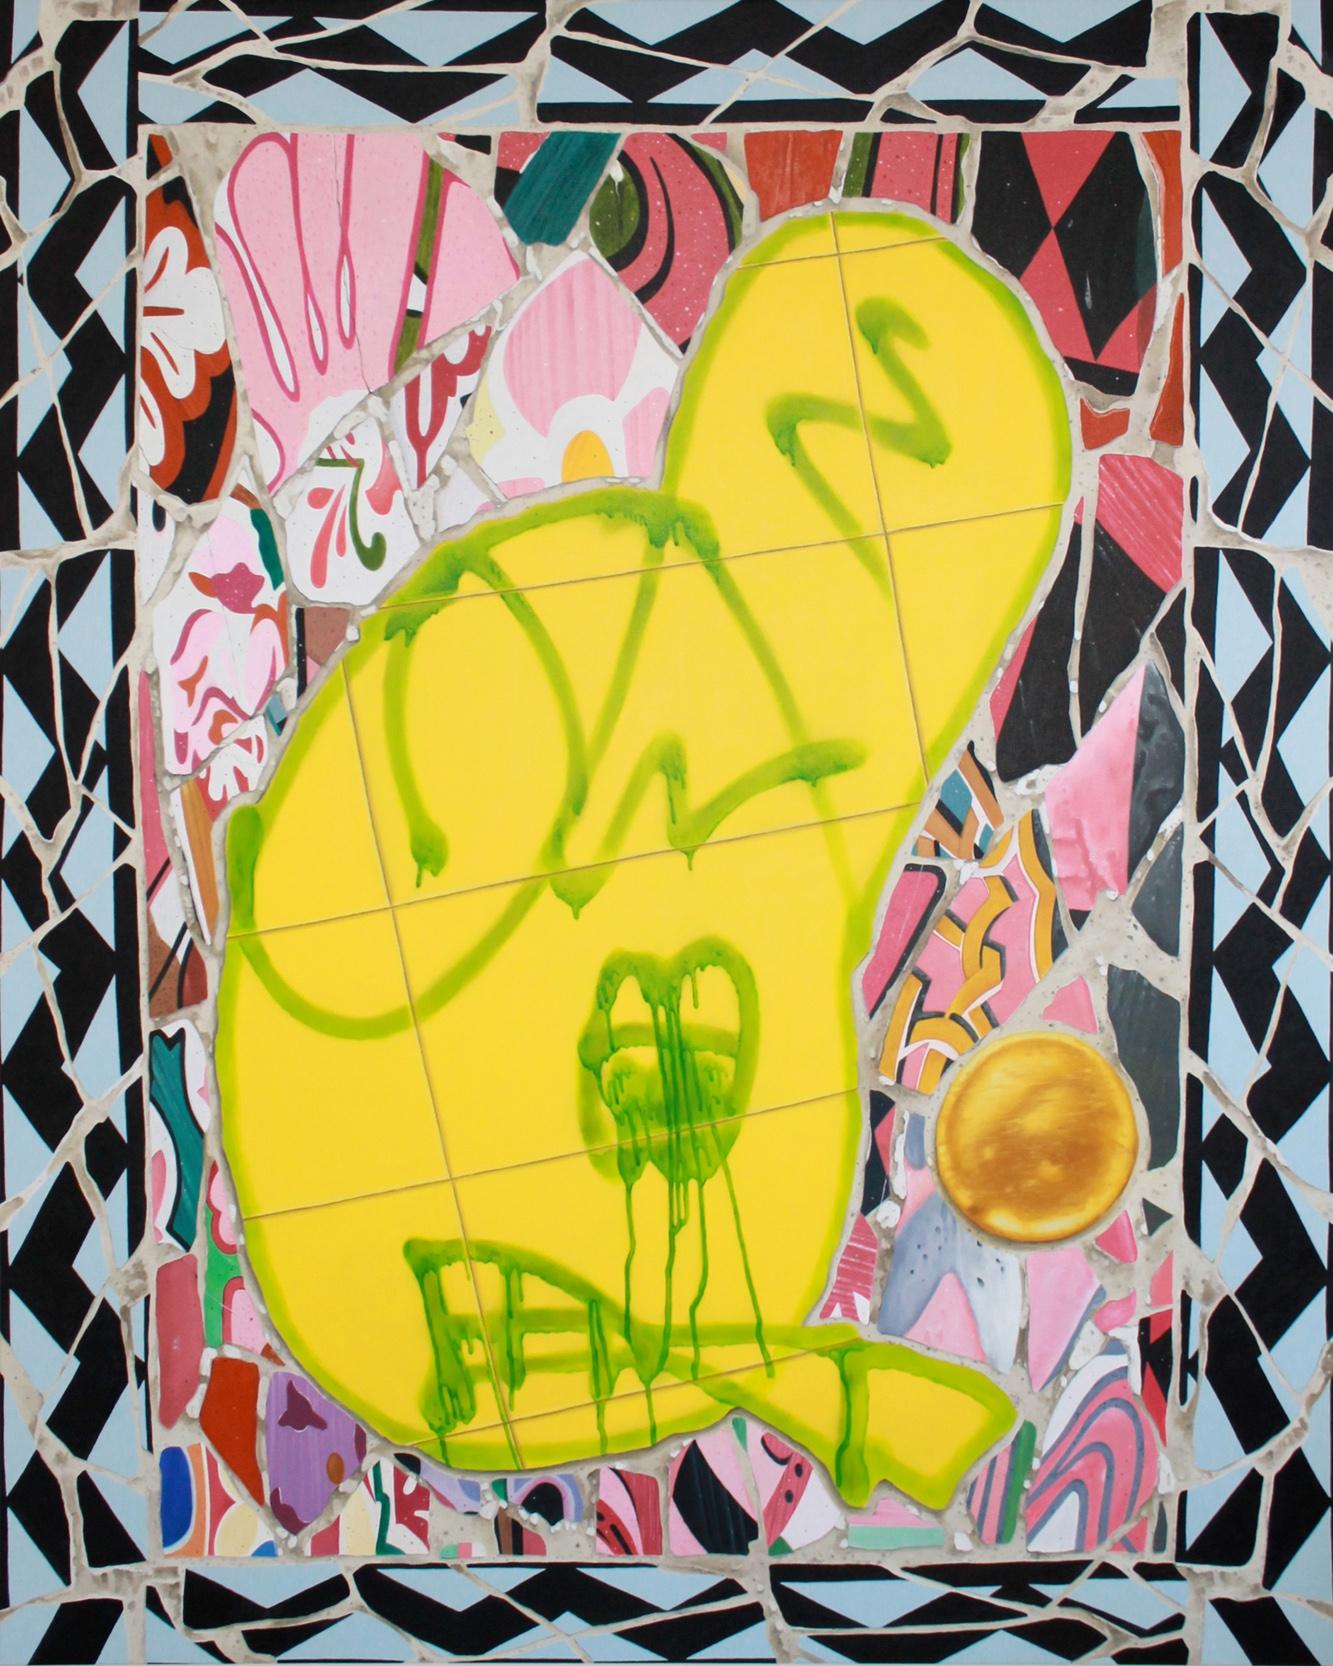 'Smokes &', Gertrude Contemporary 2014. Oil on canvas.